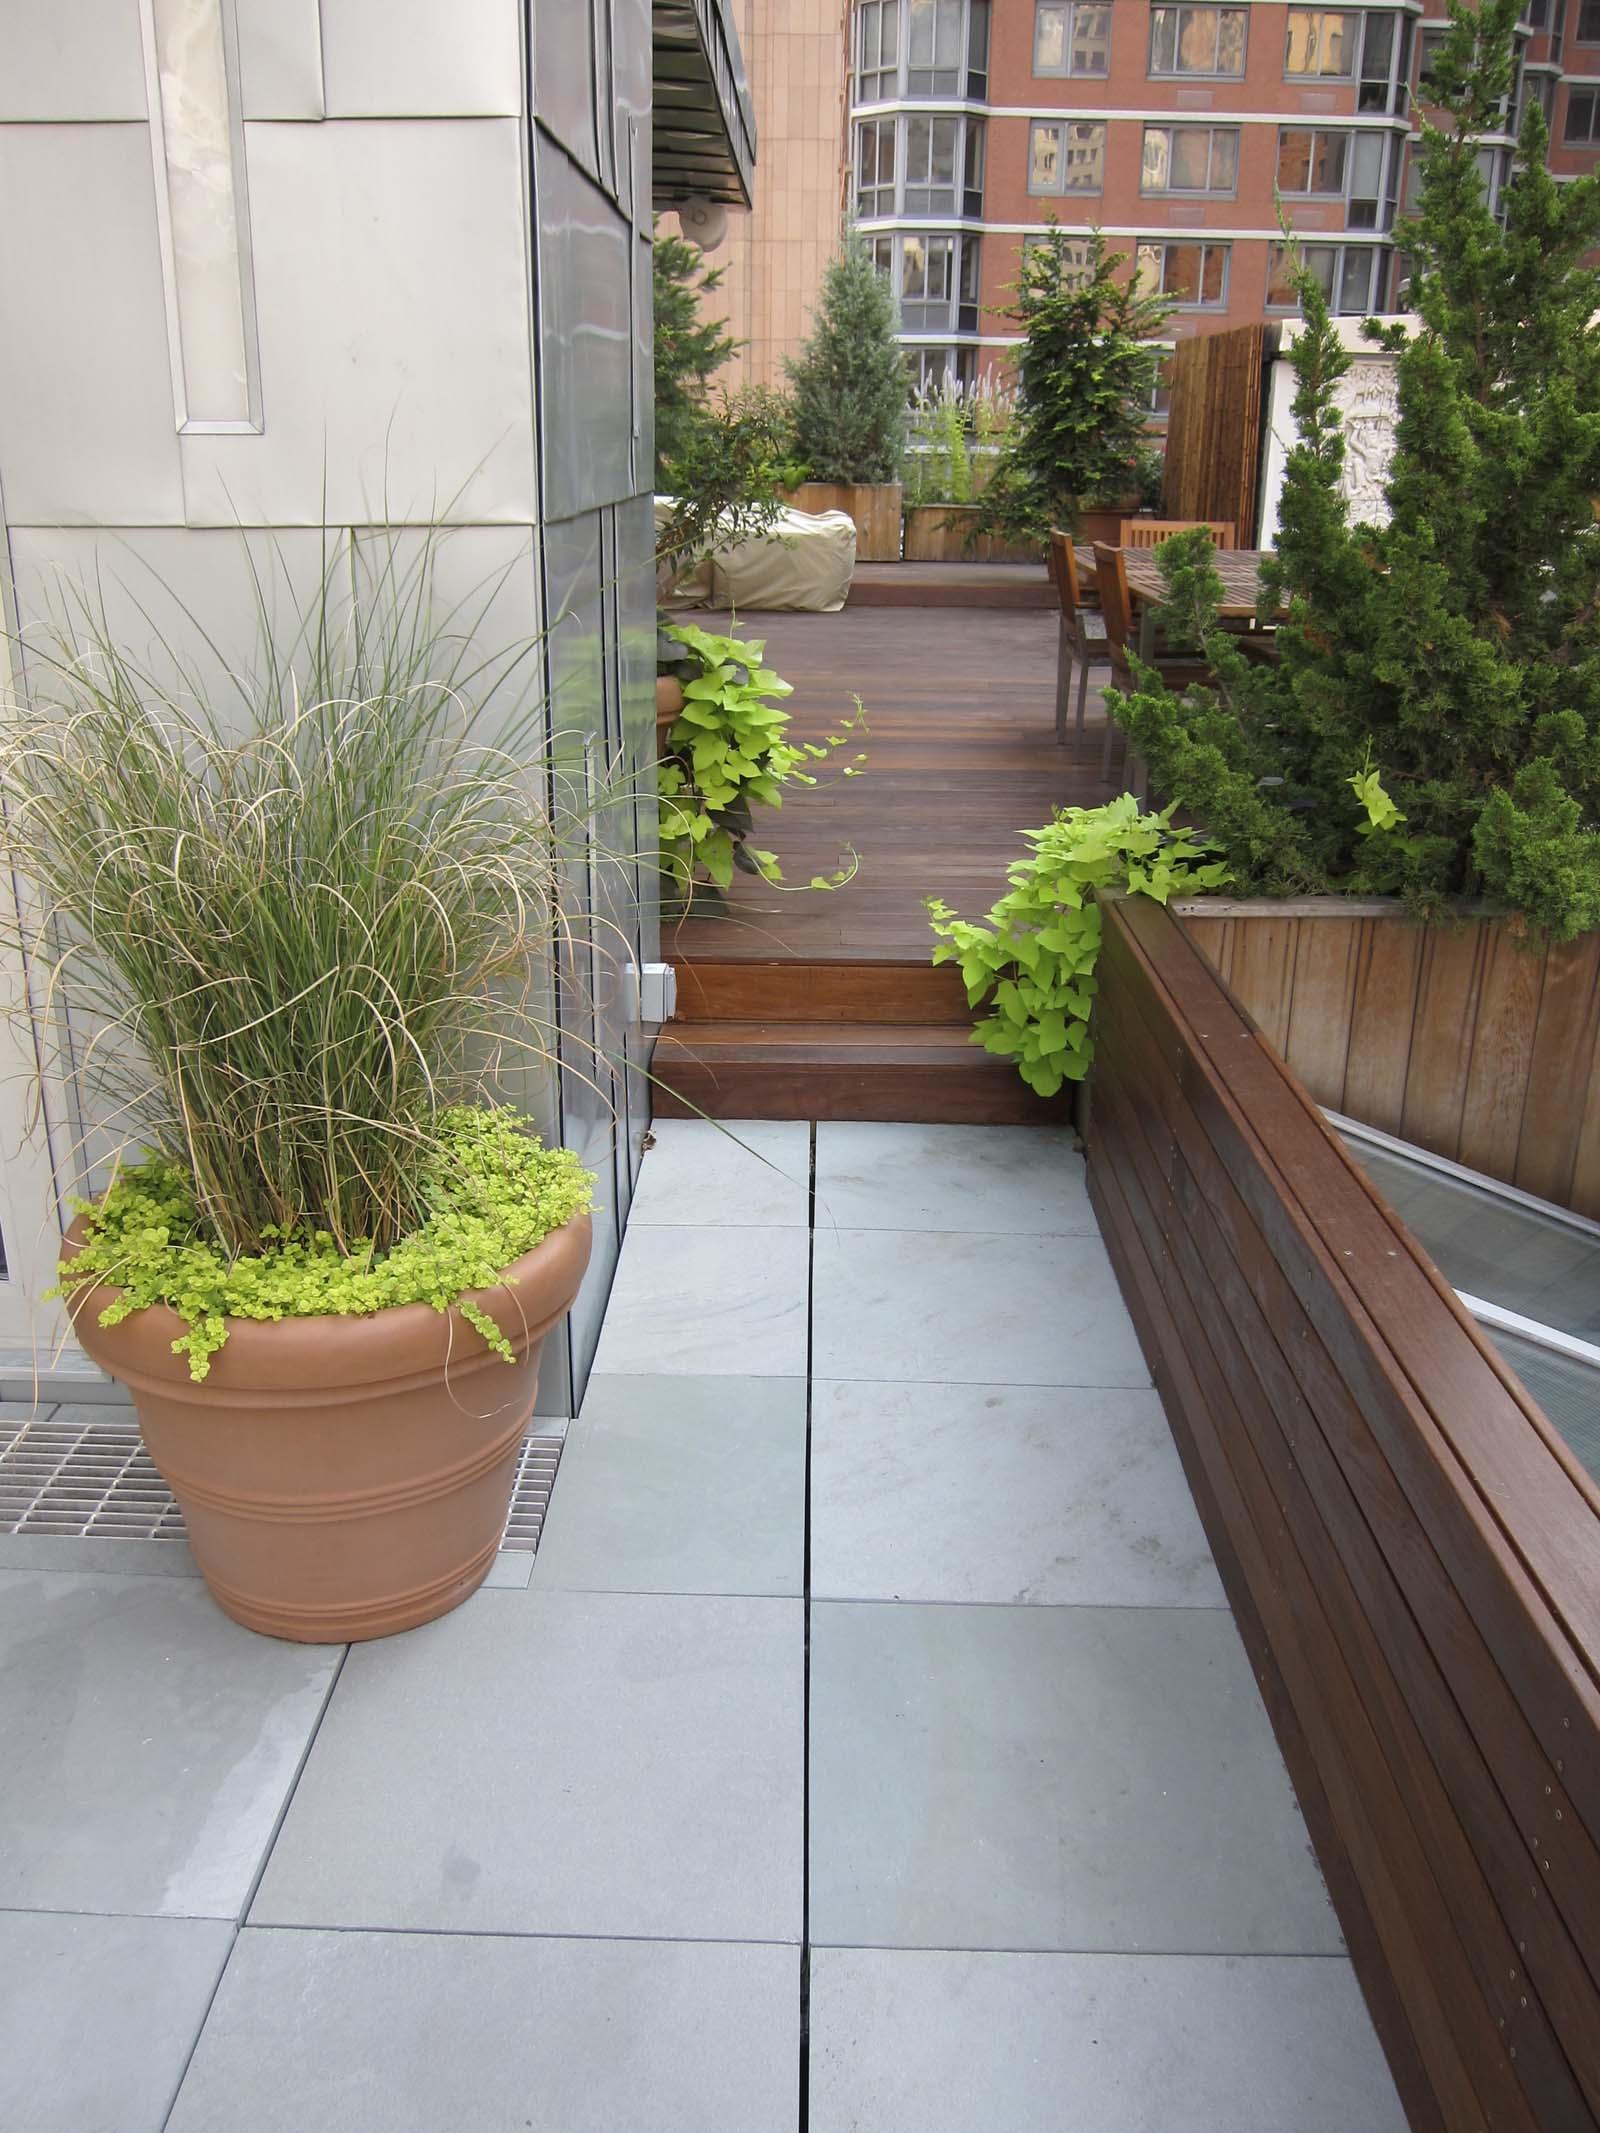 Hybrid Bluestone And Wood Deck Terrace In NYC